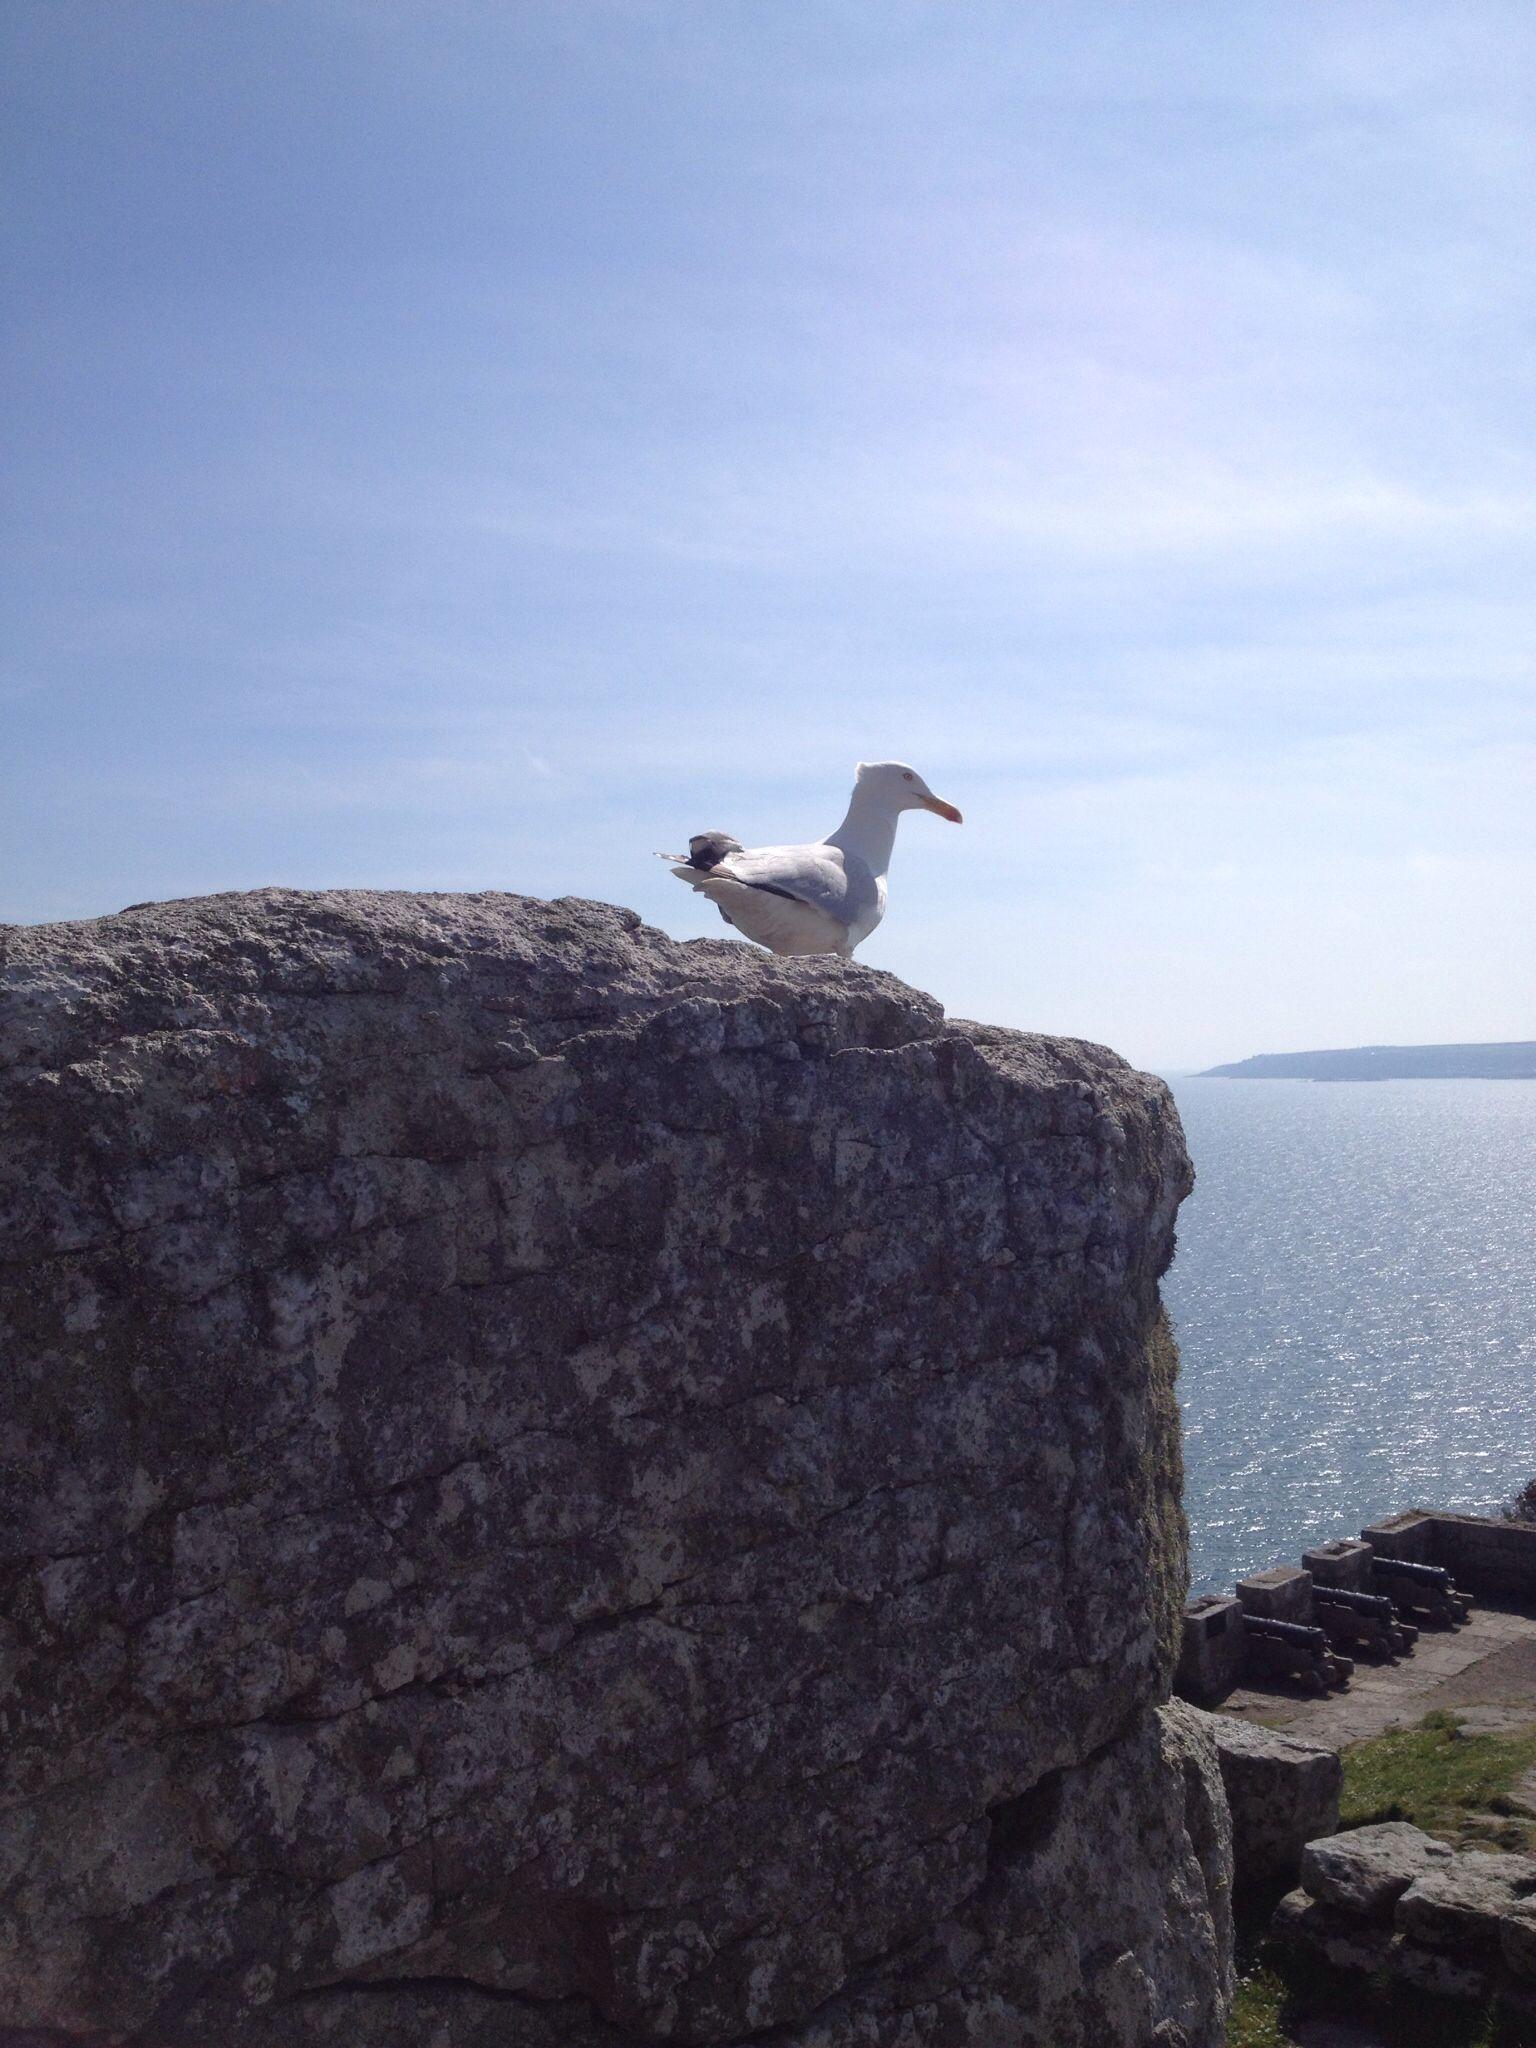 The lone seagull. St. Michael's Mount, Marazion, Cornwall